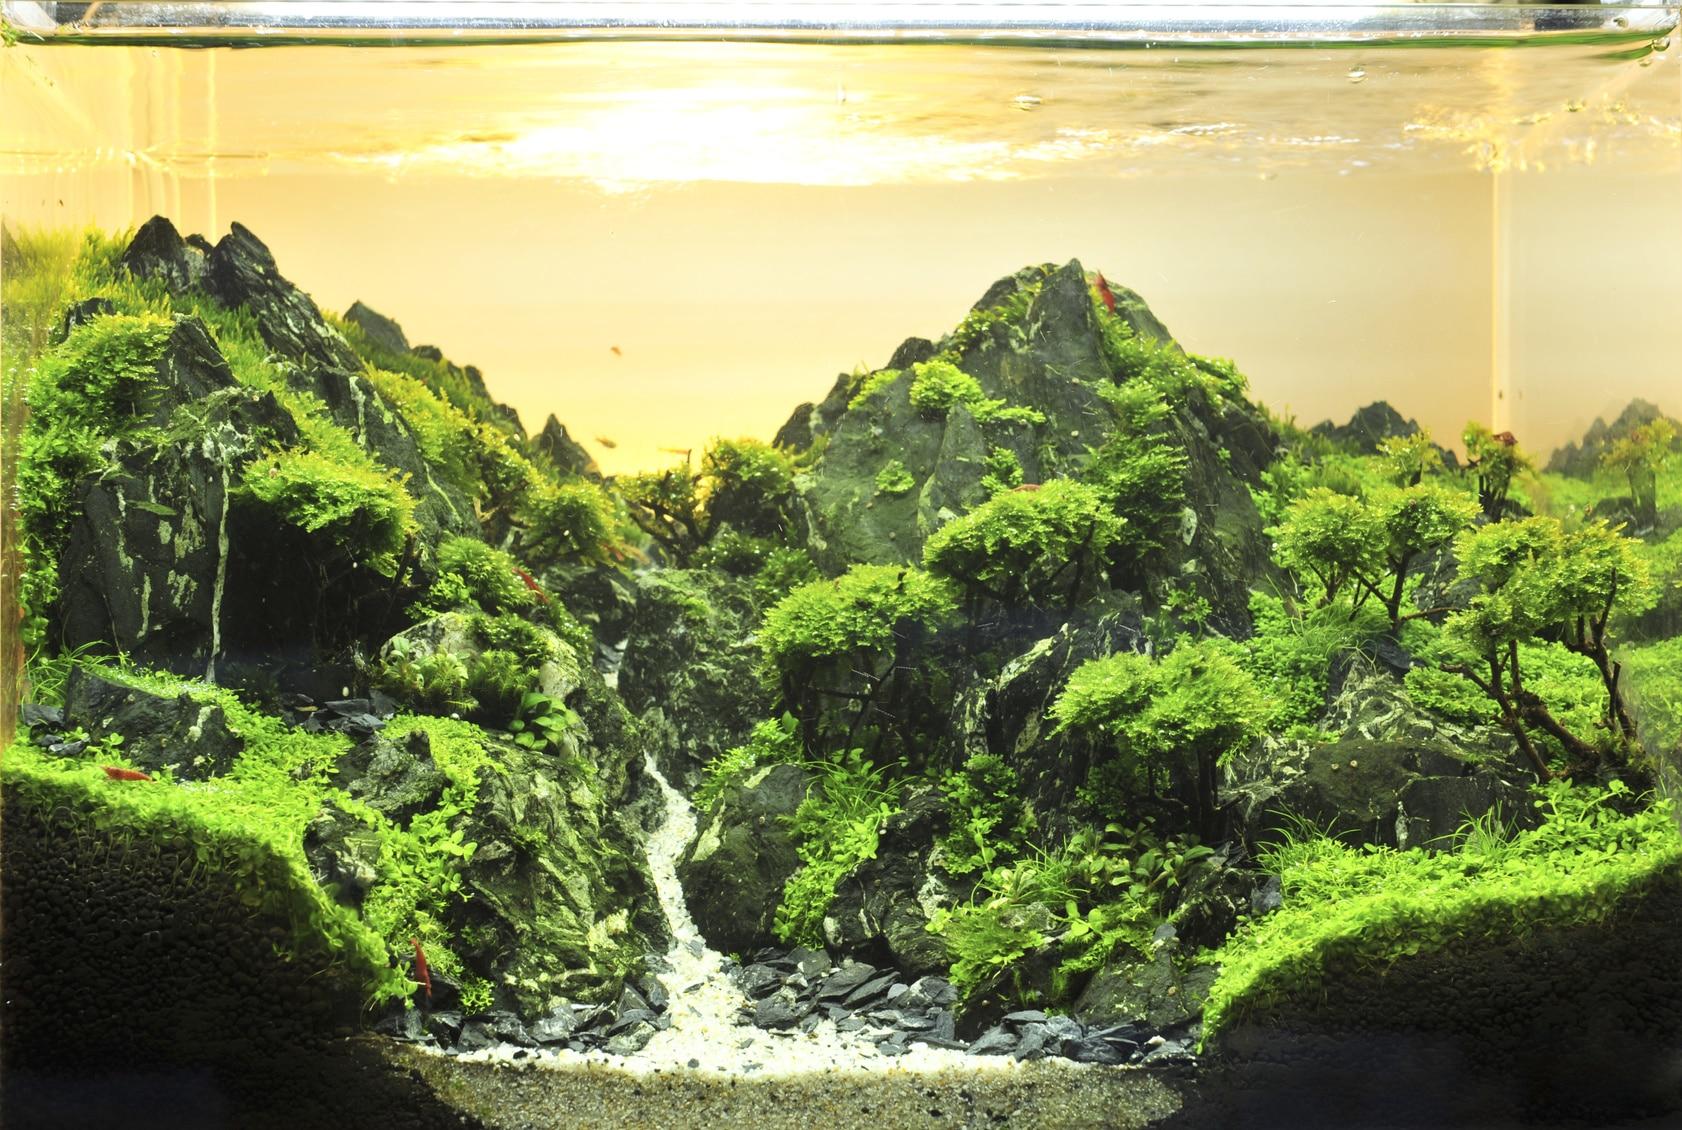   Live aquarium plants , aquascaping stone .....